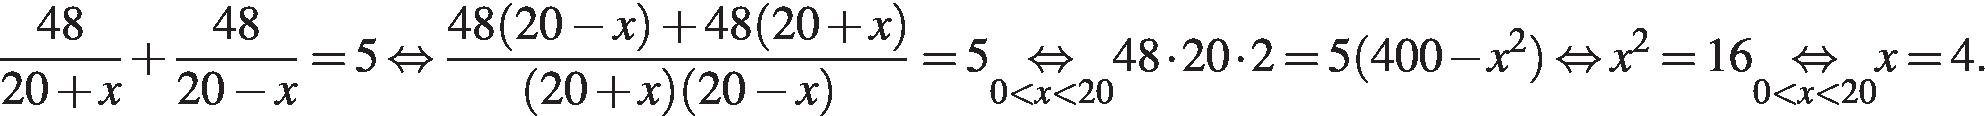 http://sdamgia.ru/formula/16/16813a087cdf7681a7b69f39cb8ab694p.png